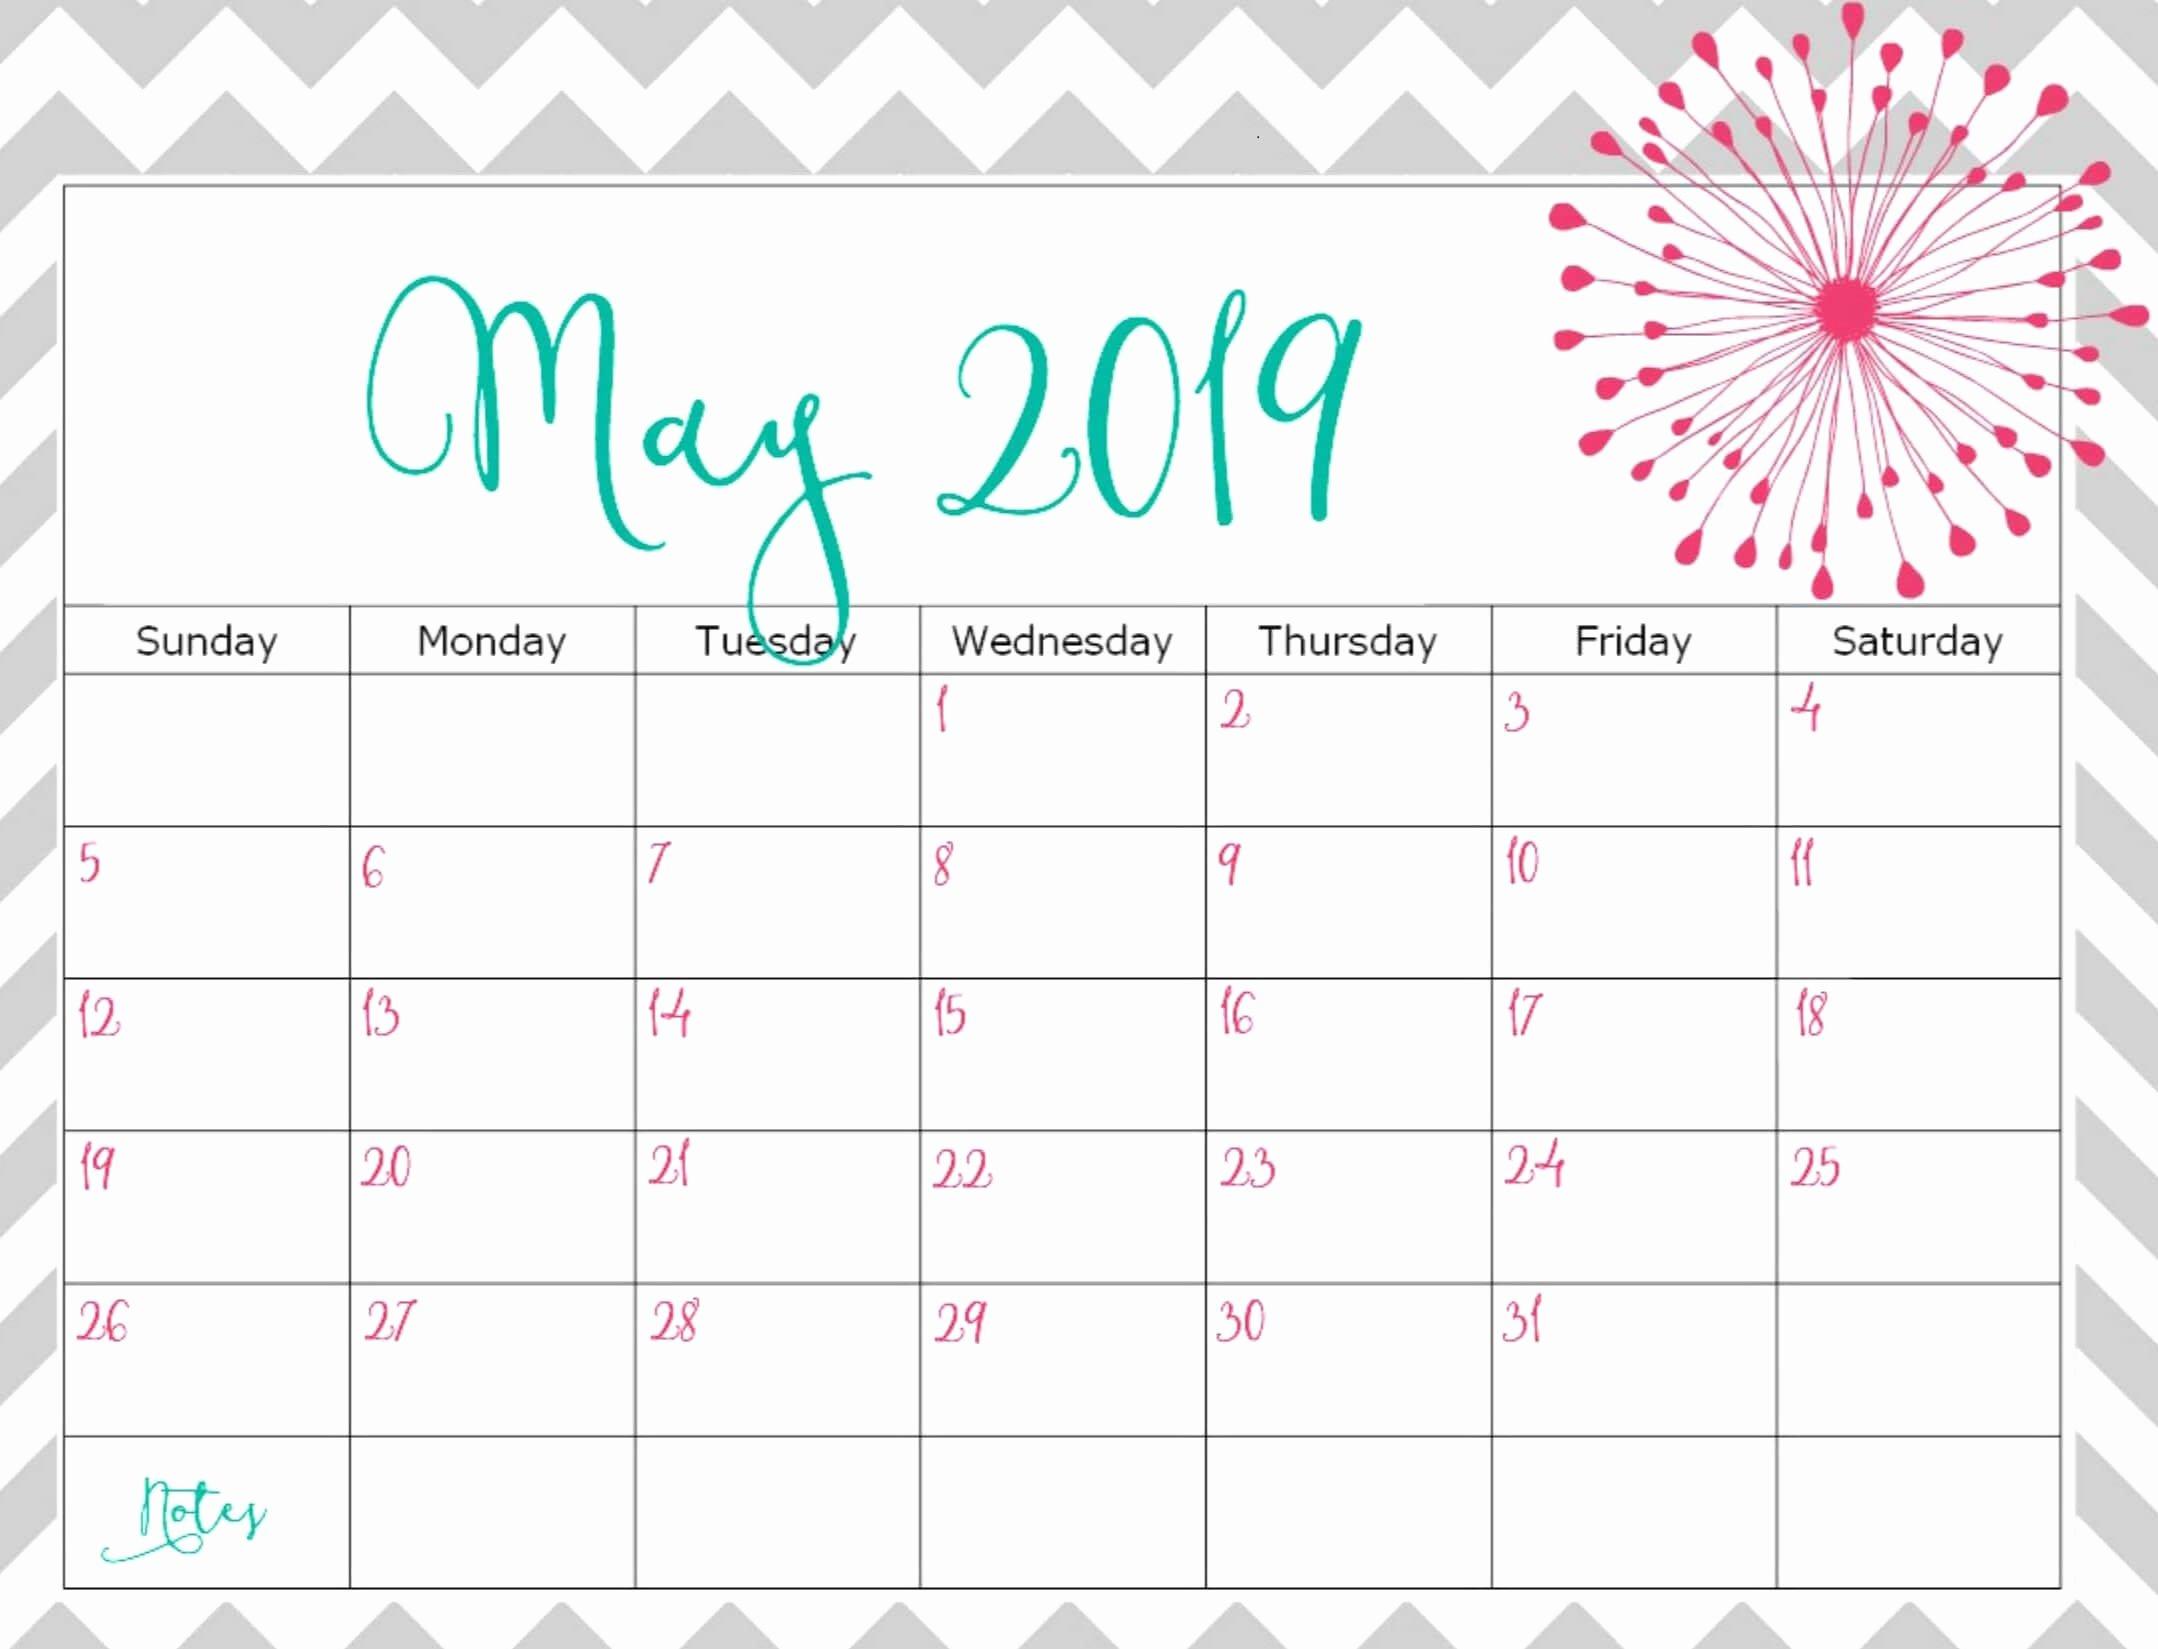 Cute Calendar Template 2019 Awesome Cute May 2019 Calendar Printable for Kids